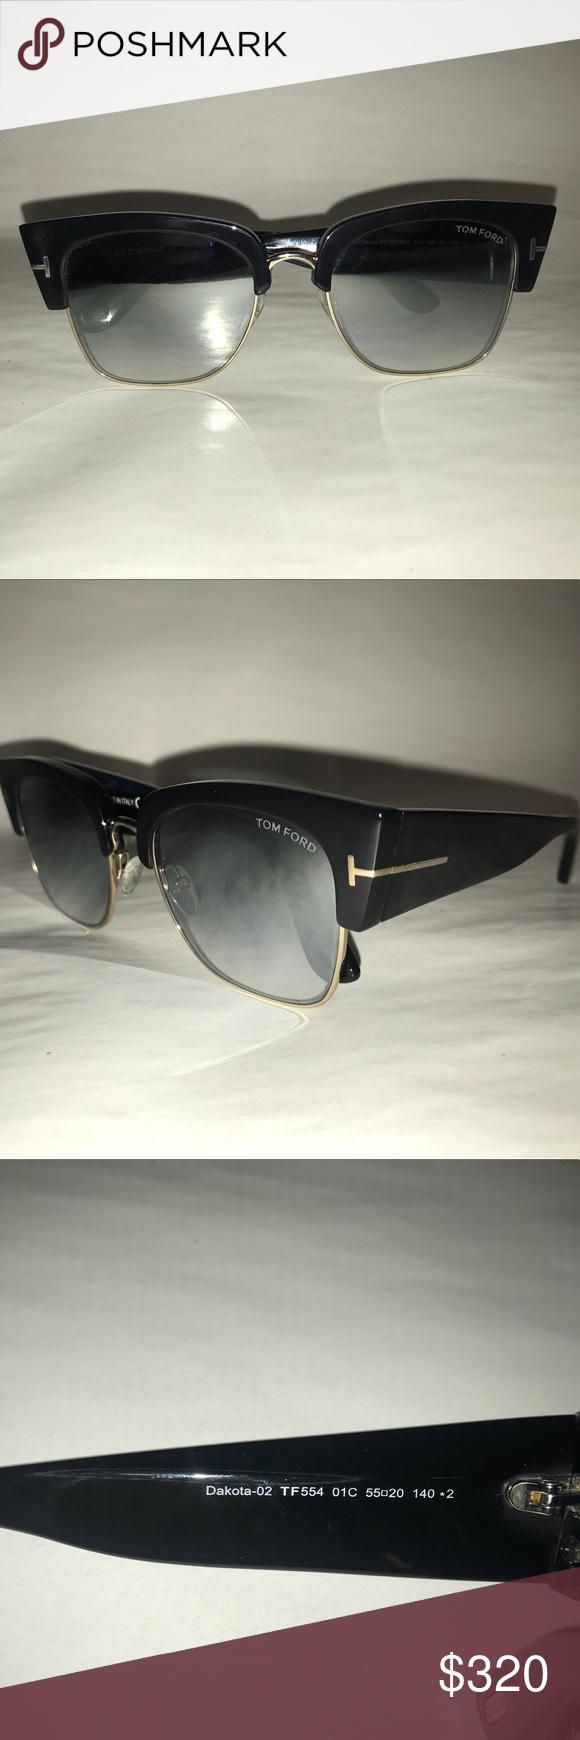 c6a231edd8 Tom Ford Dakota-02 Sunglasses Tom Ford TF 554 Dakota-02 Cat Eye Sunglasses.  Black Frame. Gradient Grey Lenses with Silver Flash Mirror. New. Never Worn.